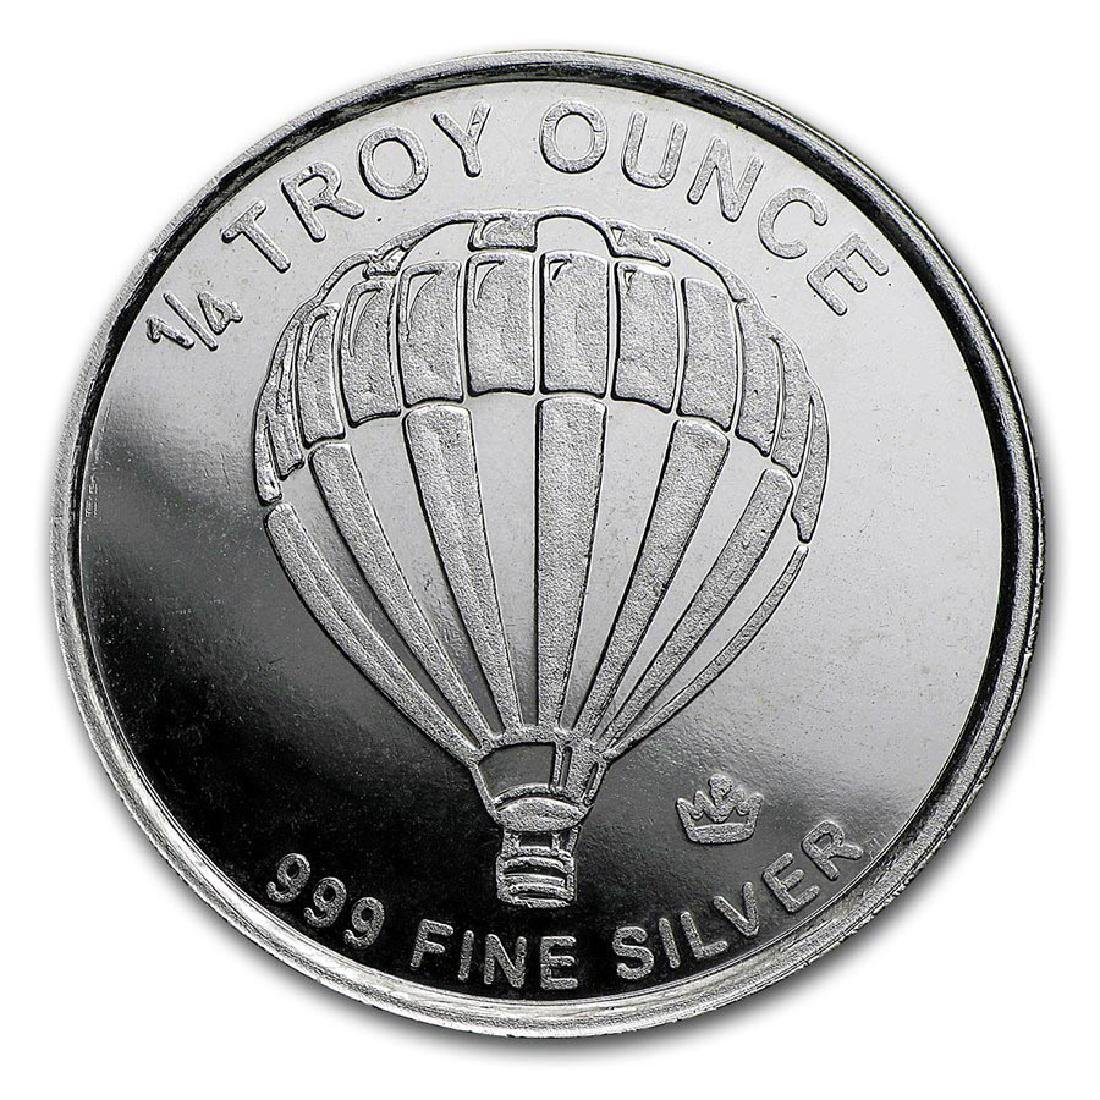 1/4 oz Silver Round - Monarch Precious Metals (Hot Air